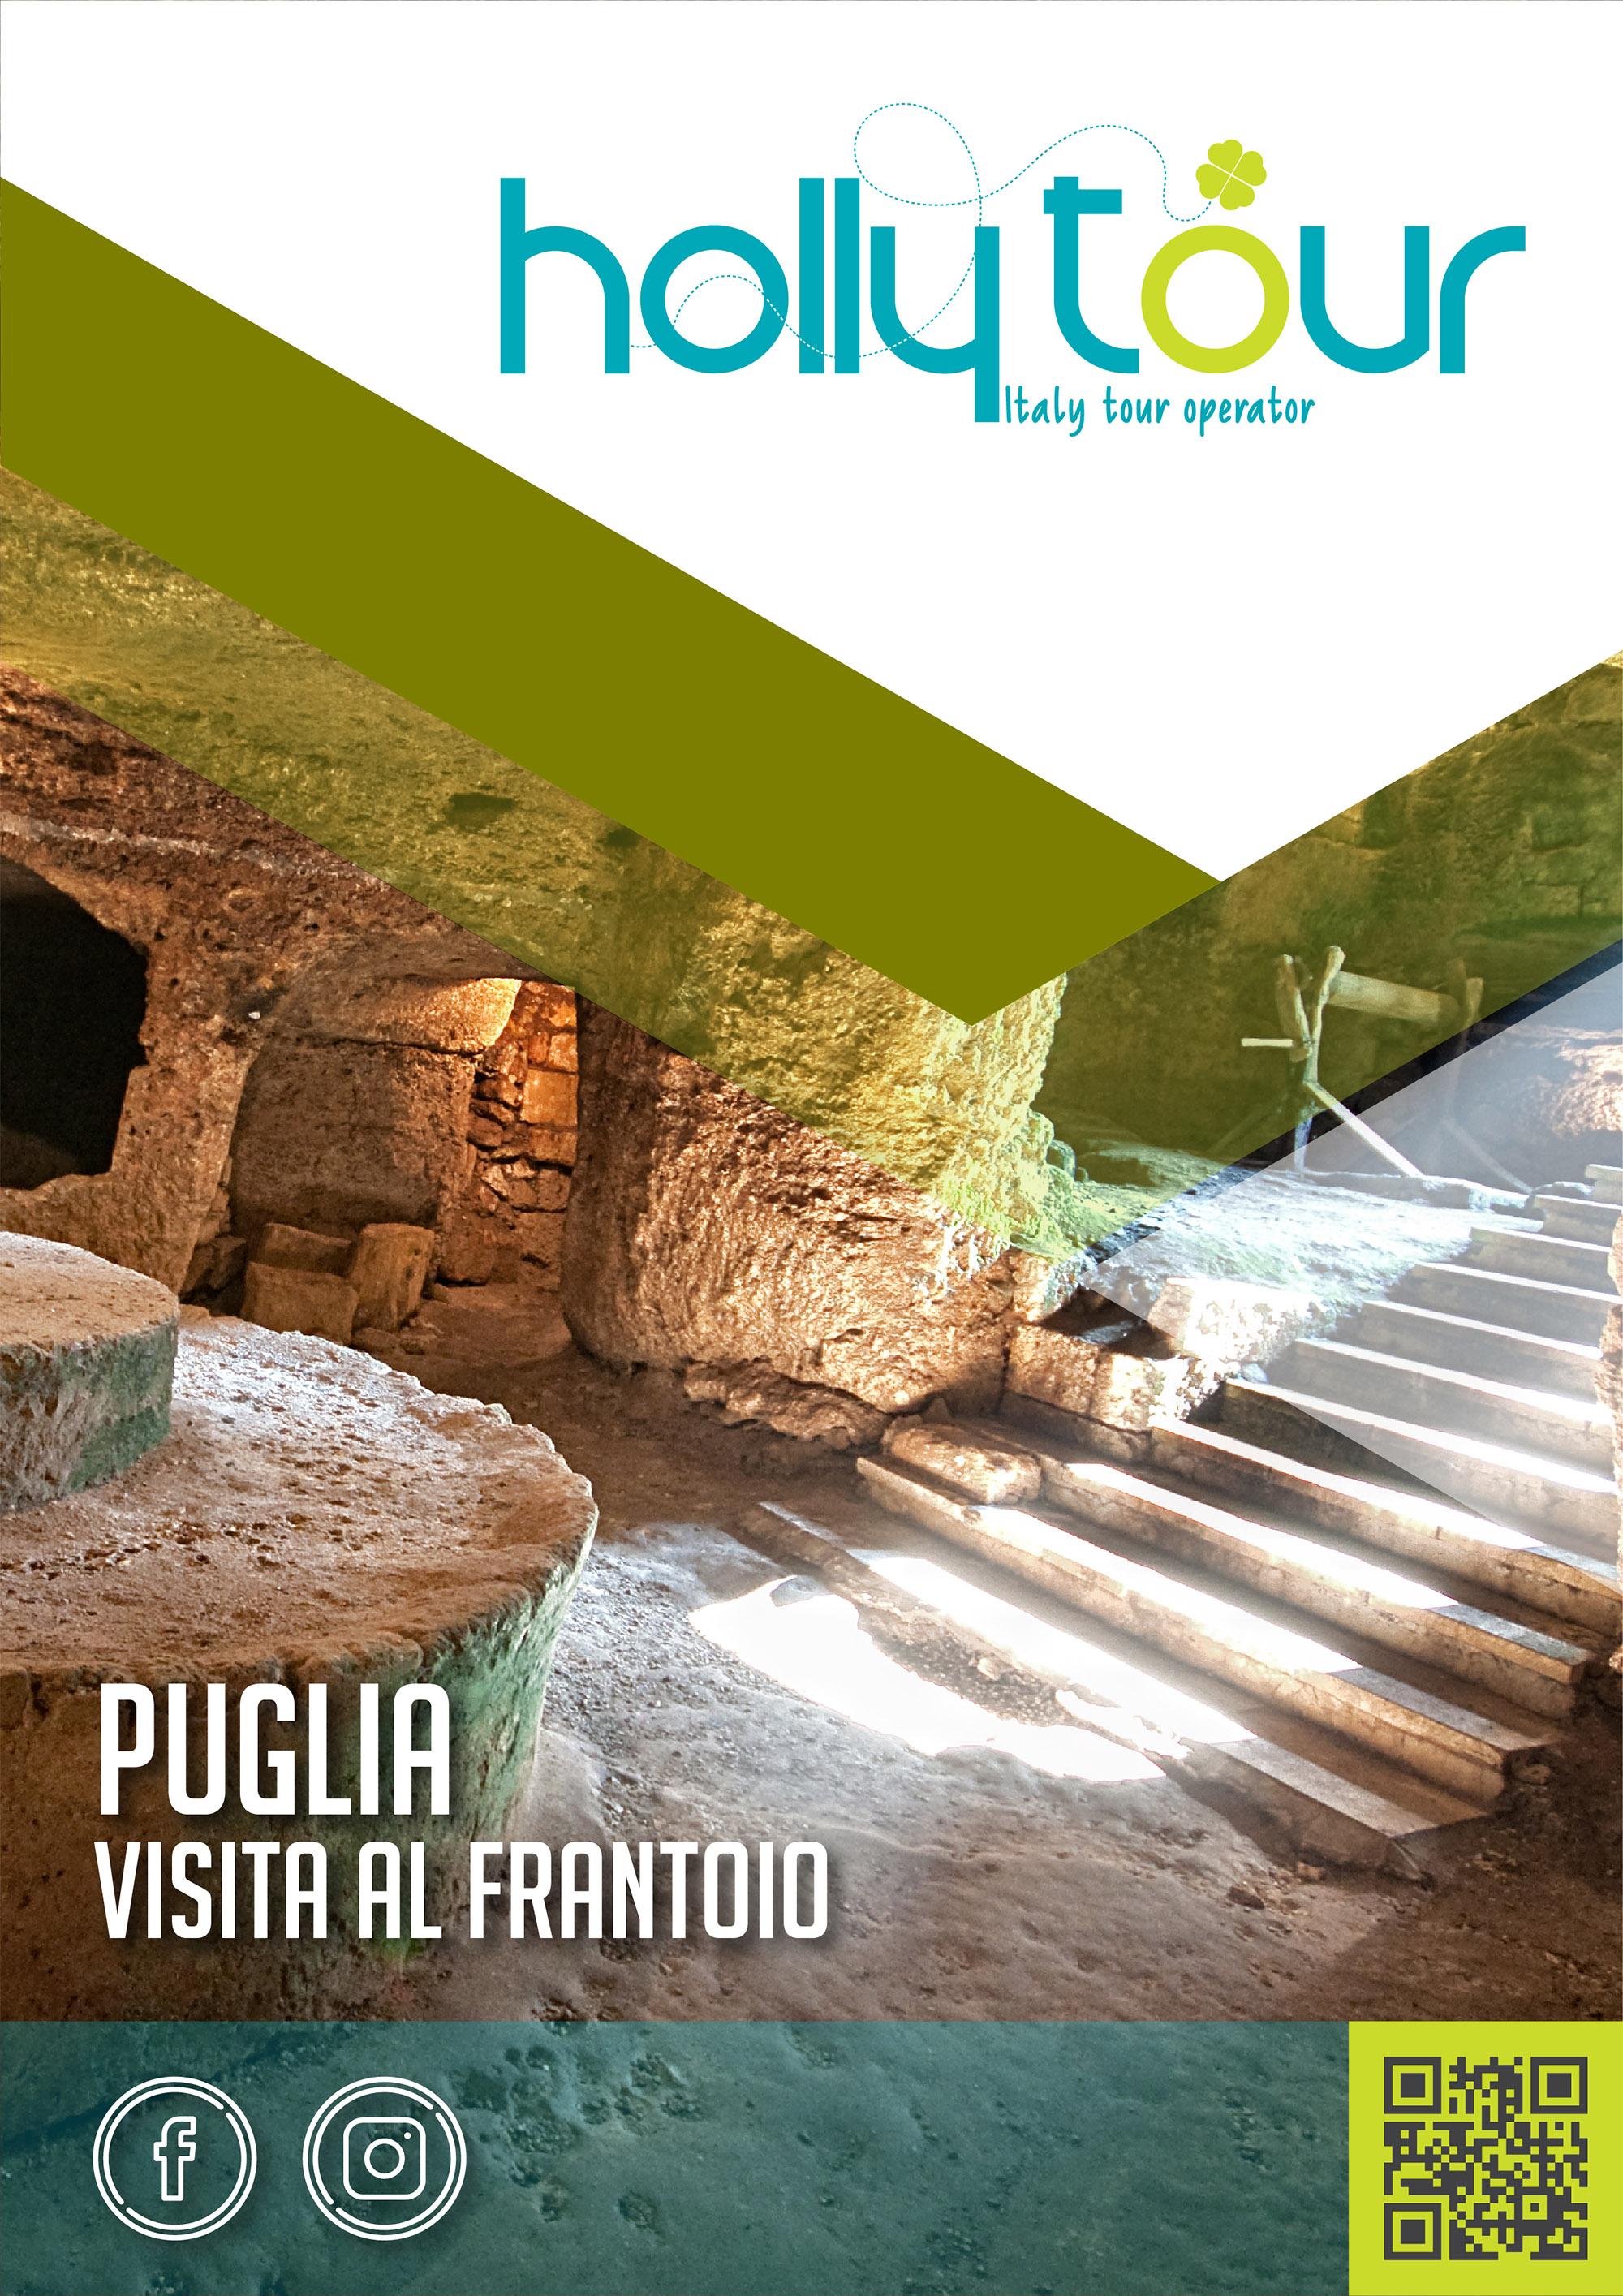 PUGLIA, VISITA AL FRANTOIO